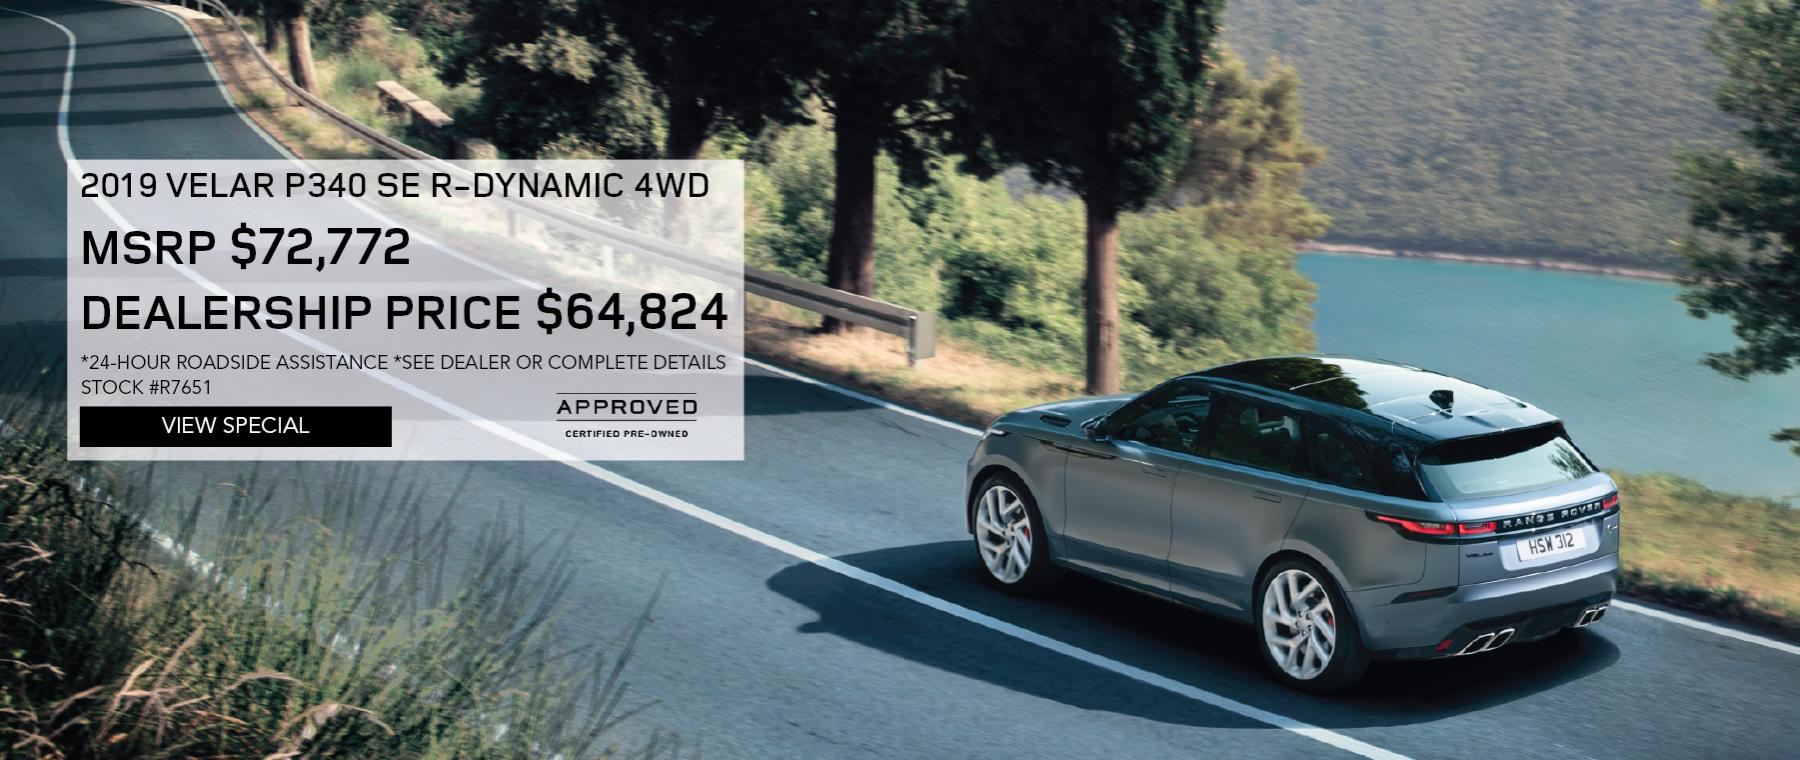 Stock #R7651 – Certified pre-owned Grey 2019 Velar P340 SE R-Dynamic 4WD on road near trees MSRP - $72,772 Dealership price - $64,824. *24-hour roadside assistance. See dealer for complete details.